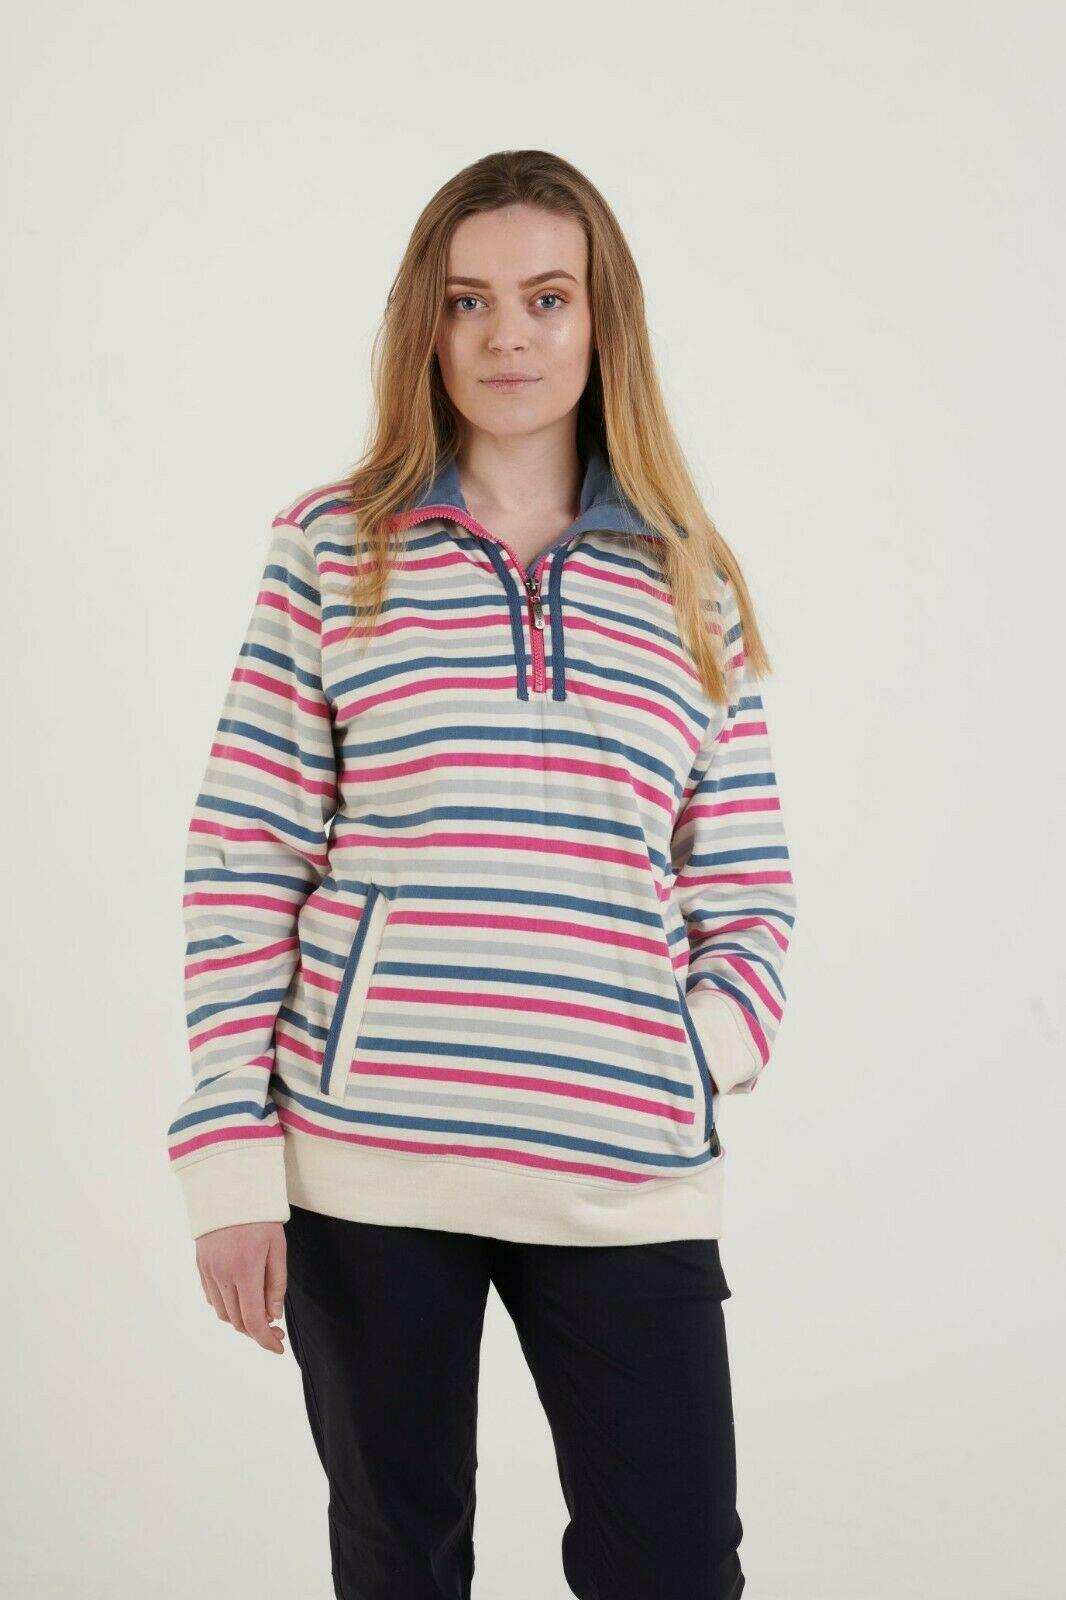 miniatuur 3 - Hazy Blue Womens Zip Neck Striped Cotton Sweatshirt Top Evie II Jumper cosy